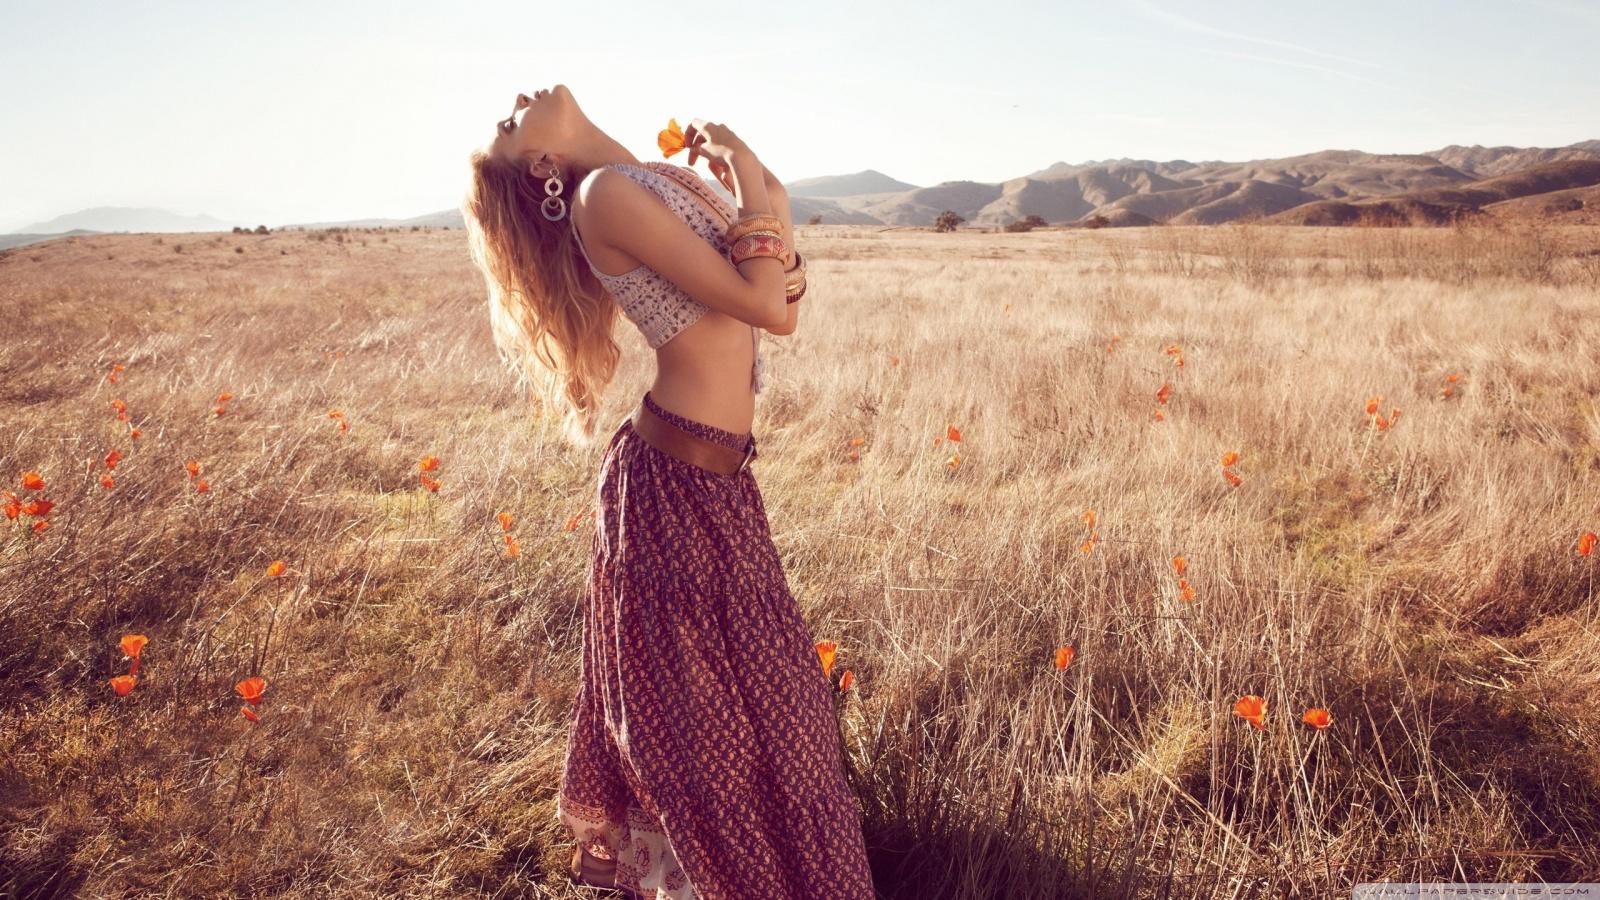 Fall Bohemian Fashion Wallpaper Hippie Girl Outdoor 4k Hd Desktop Wallpaper For 4k Ultra